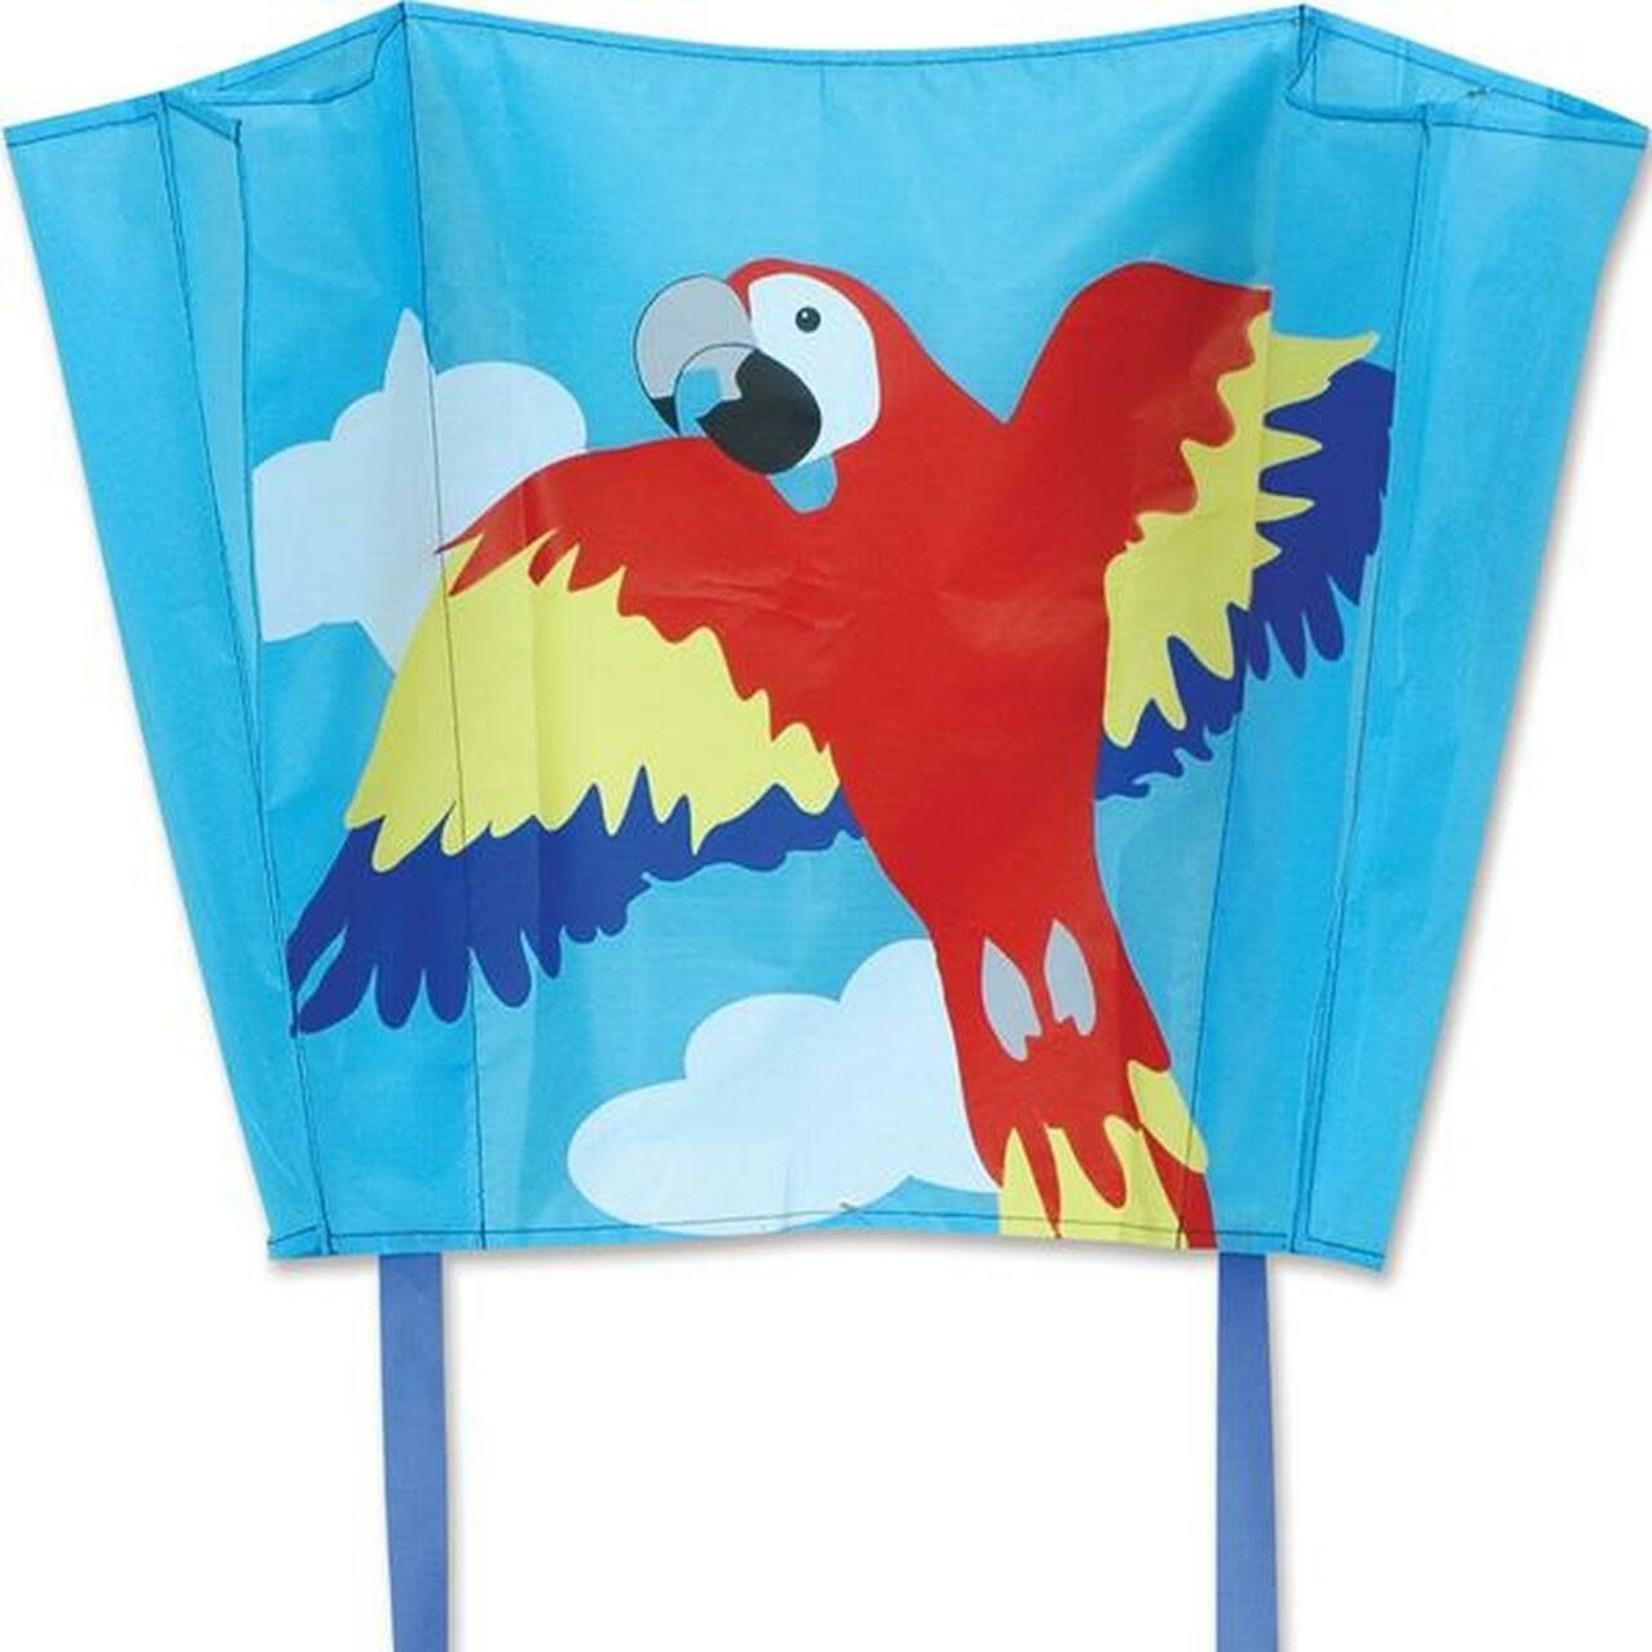 Premier Kites Big Back Pack Sled Kite- Macaw